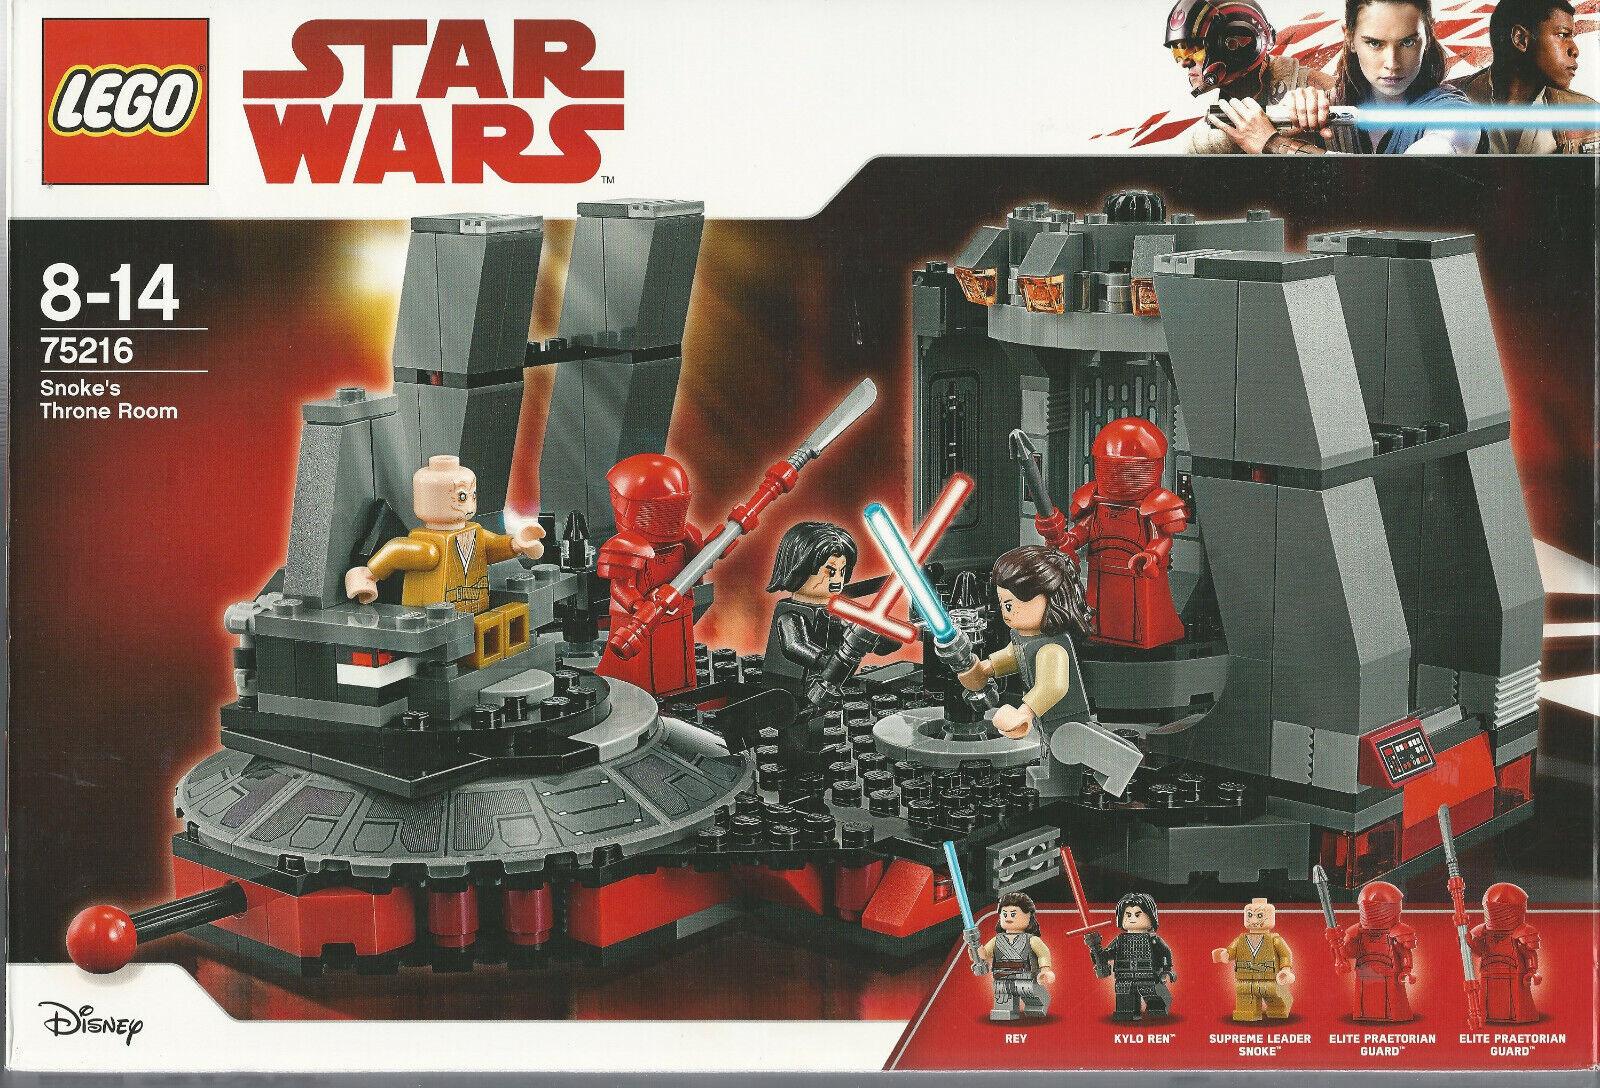 LEGO estrella guerras 75216 SNOKE'S THRONE ROOM nuovo Nuevo  NIB Rey Kylo Ren Praetorian G  in cerca di agente di vendita